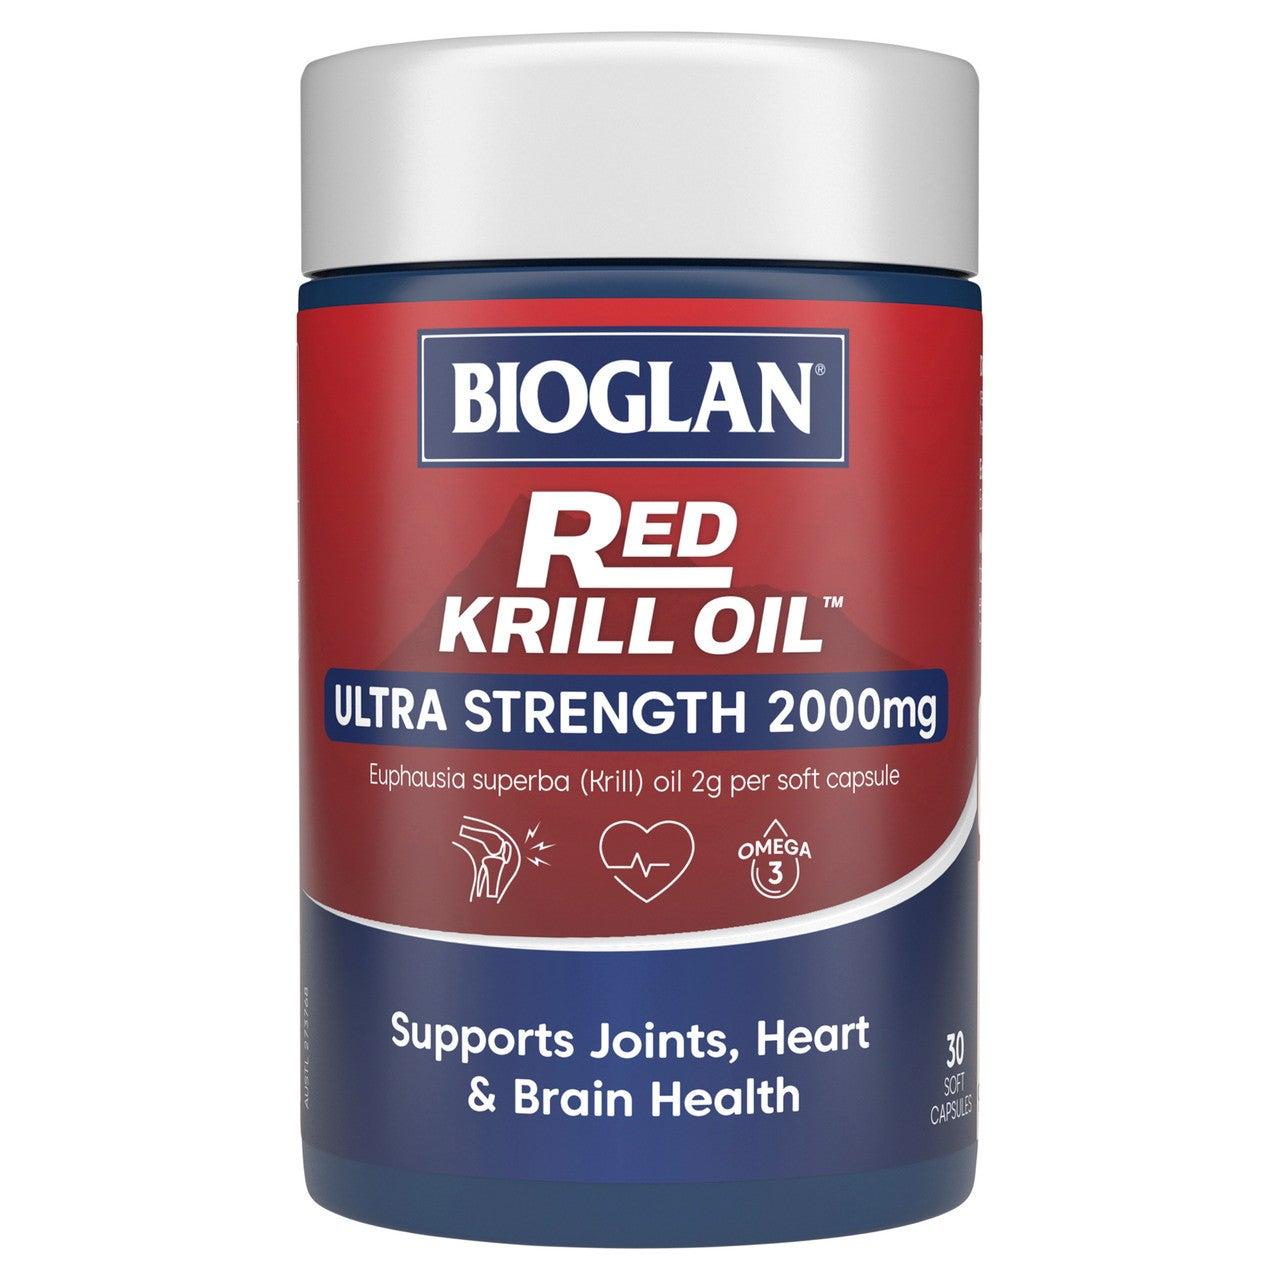 Bioglan High Dose Red Krill Oil 2000mg 30 Soft Capsules